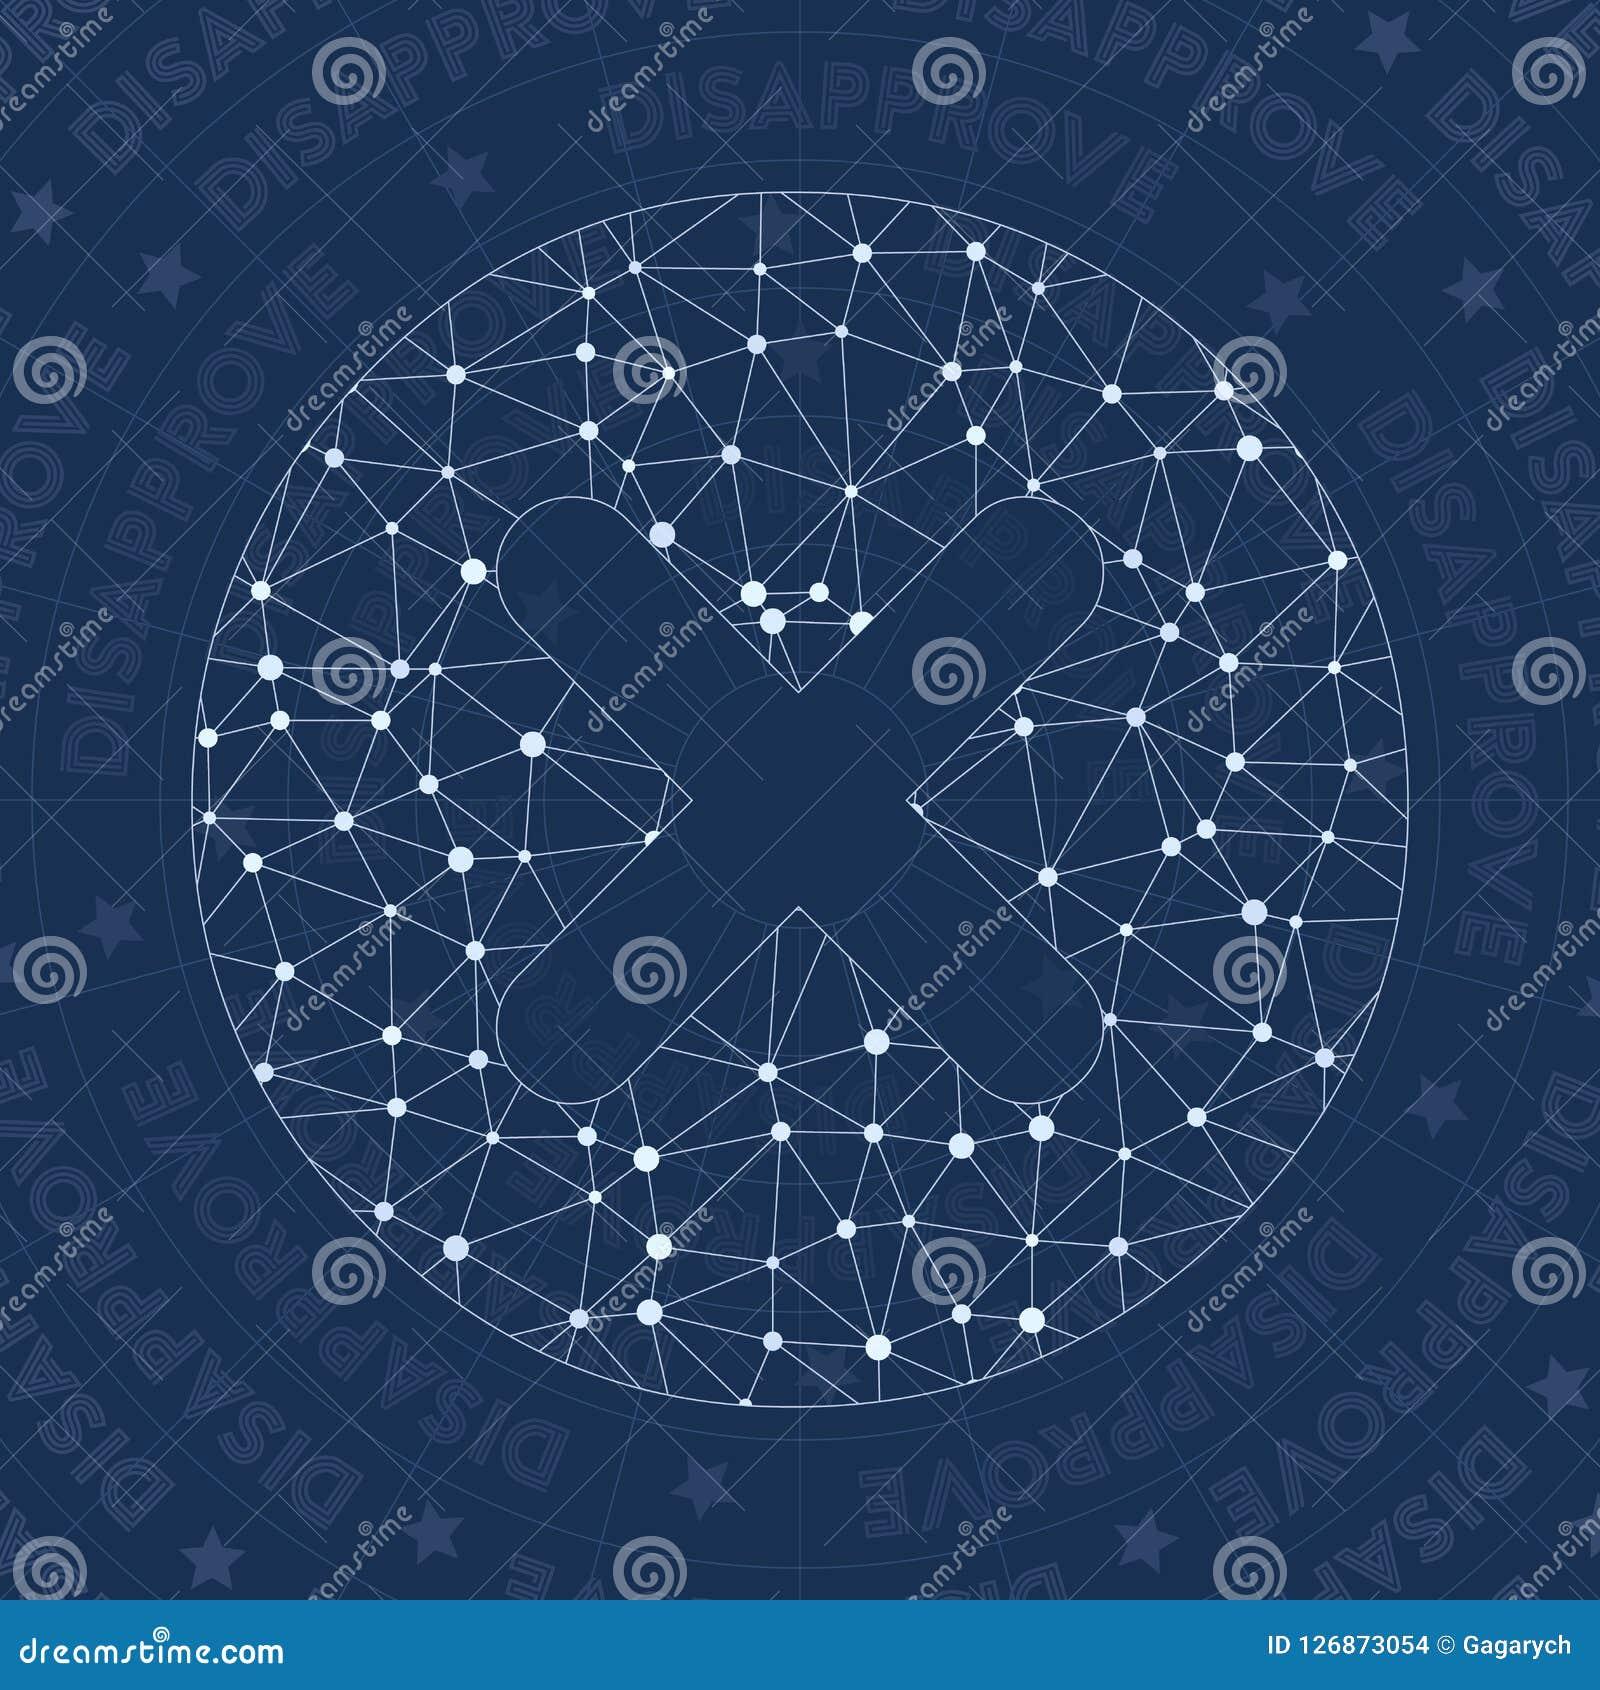 Disapprove Network Symbol Stock Vector Illustration Of Error